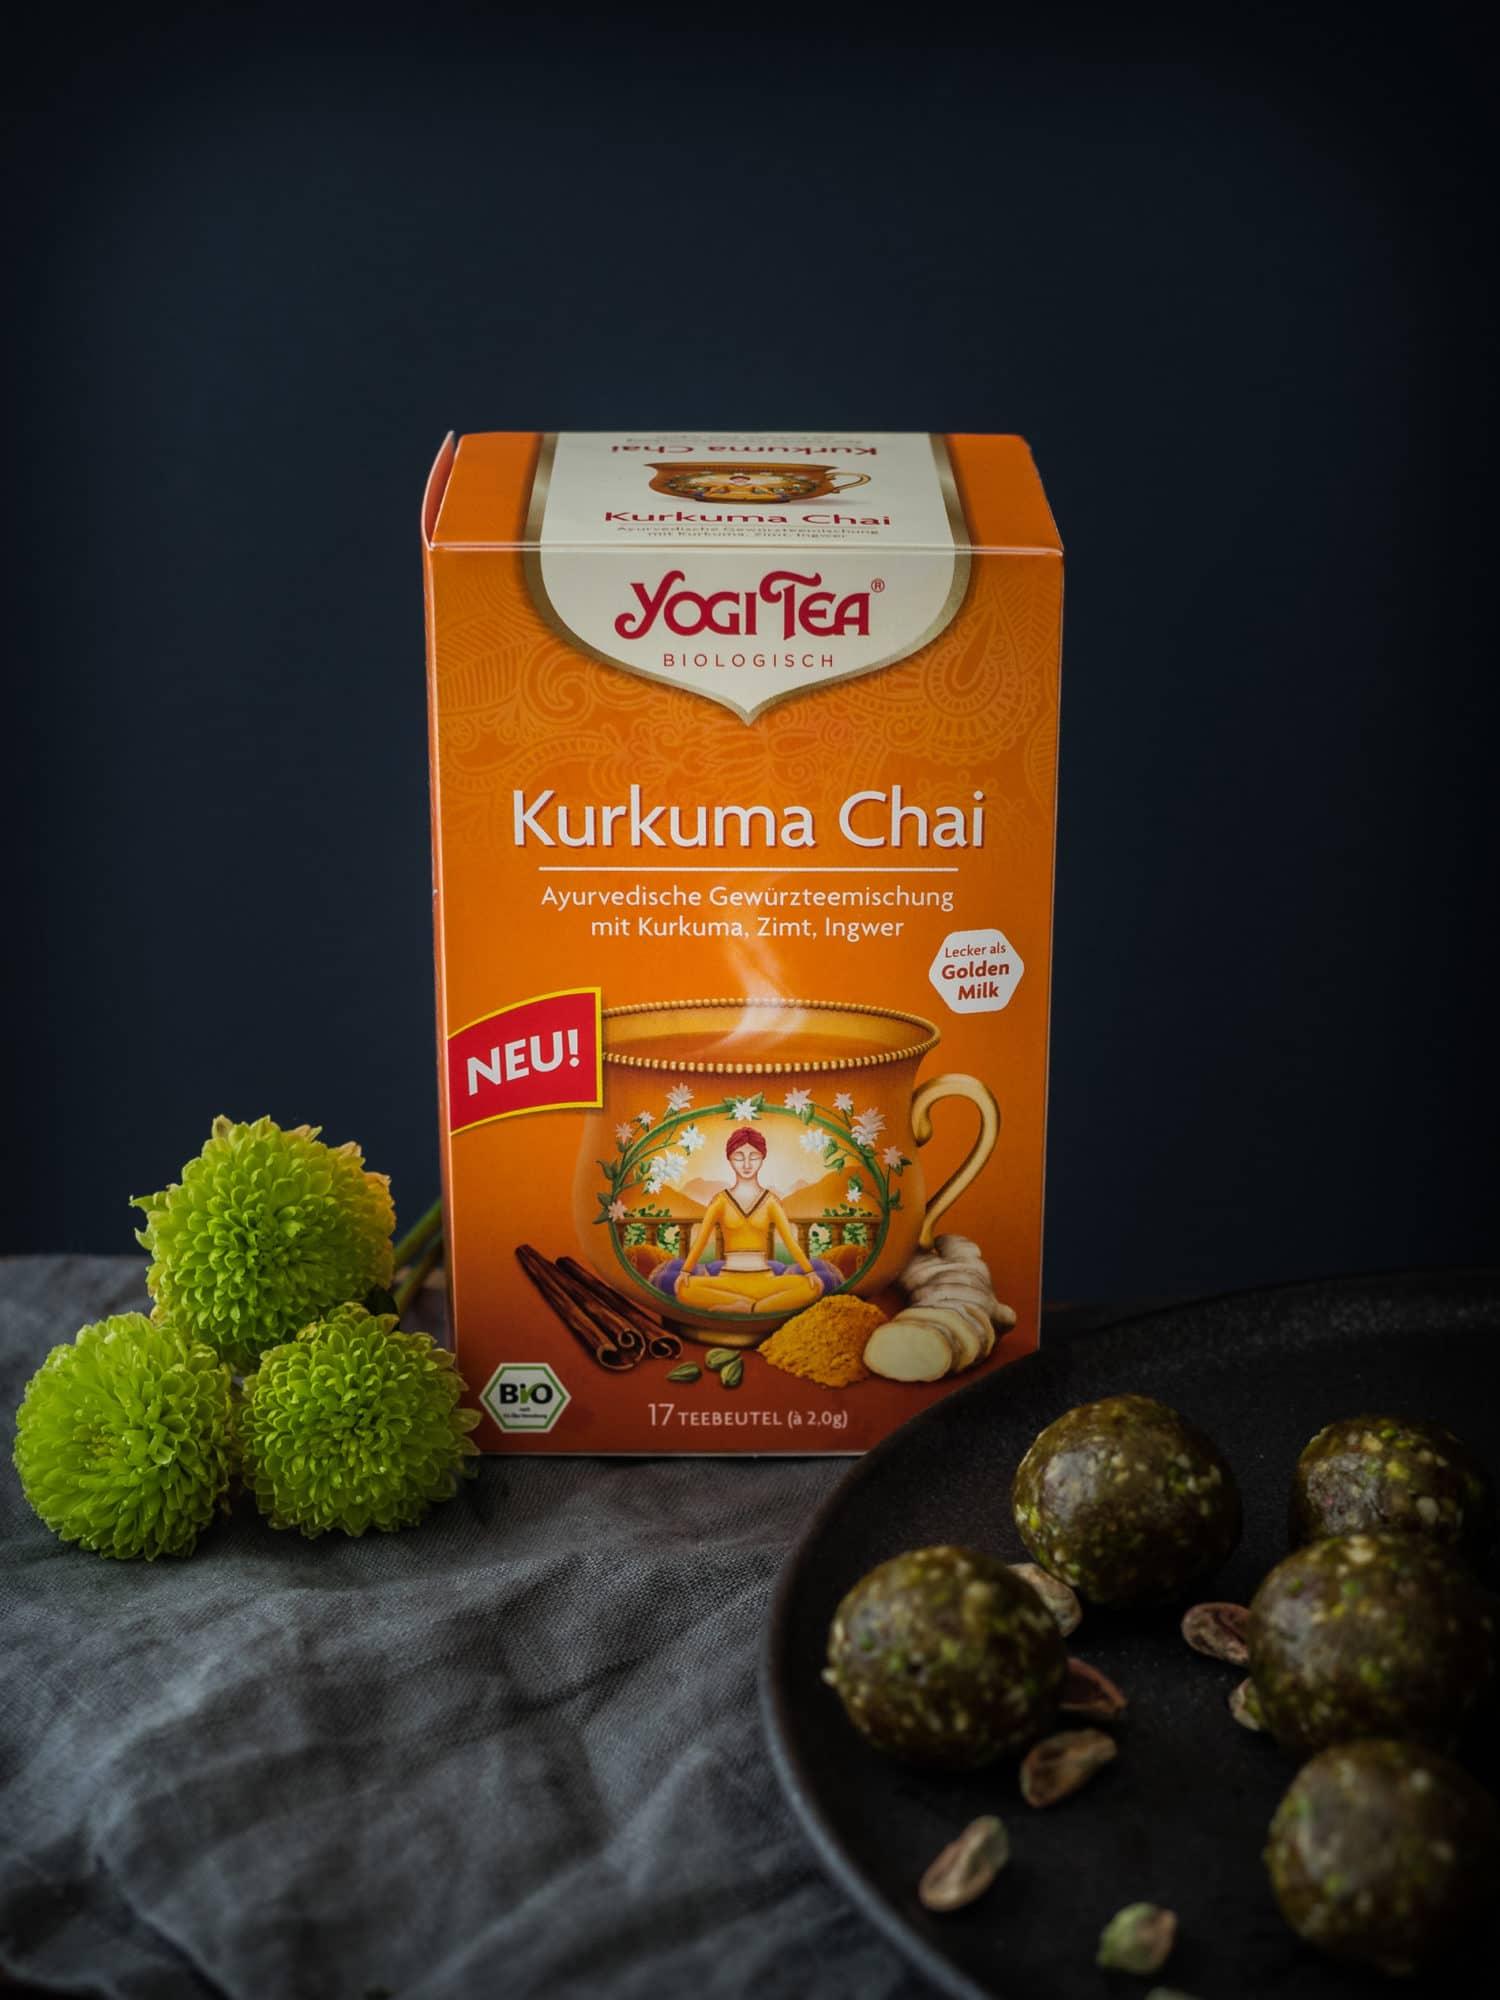 Ayurveda Energyballs und Kurkuma Chai von YOGI TEA